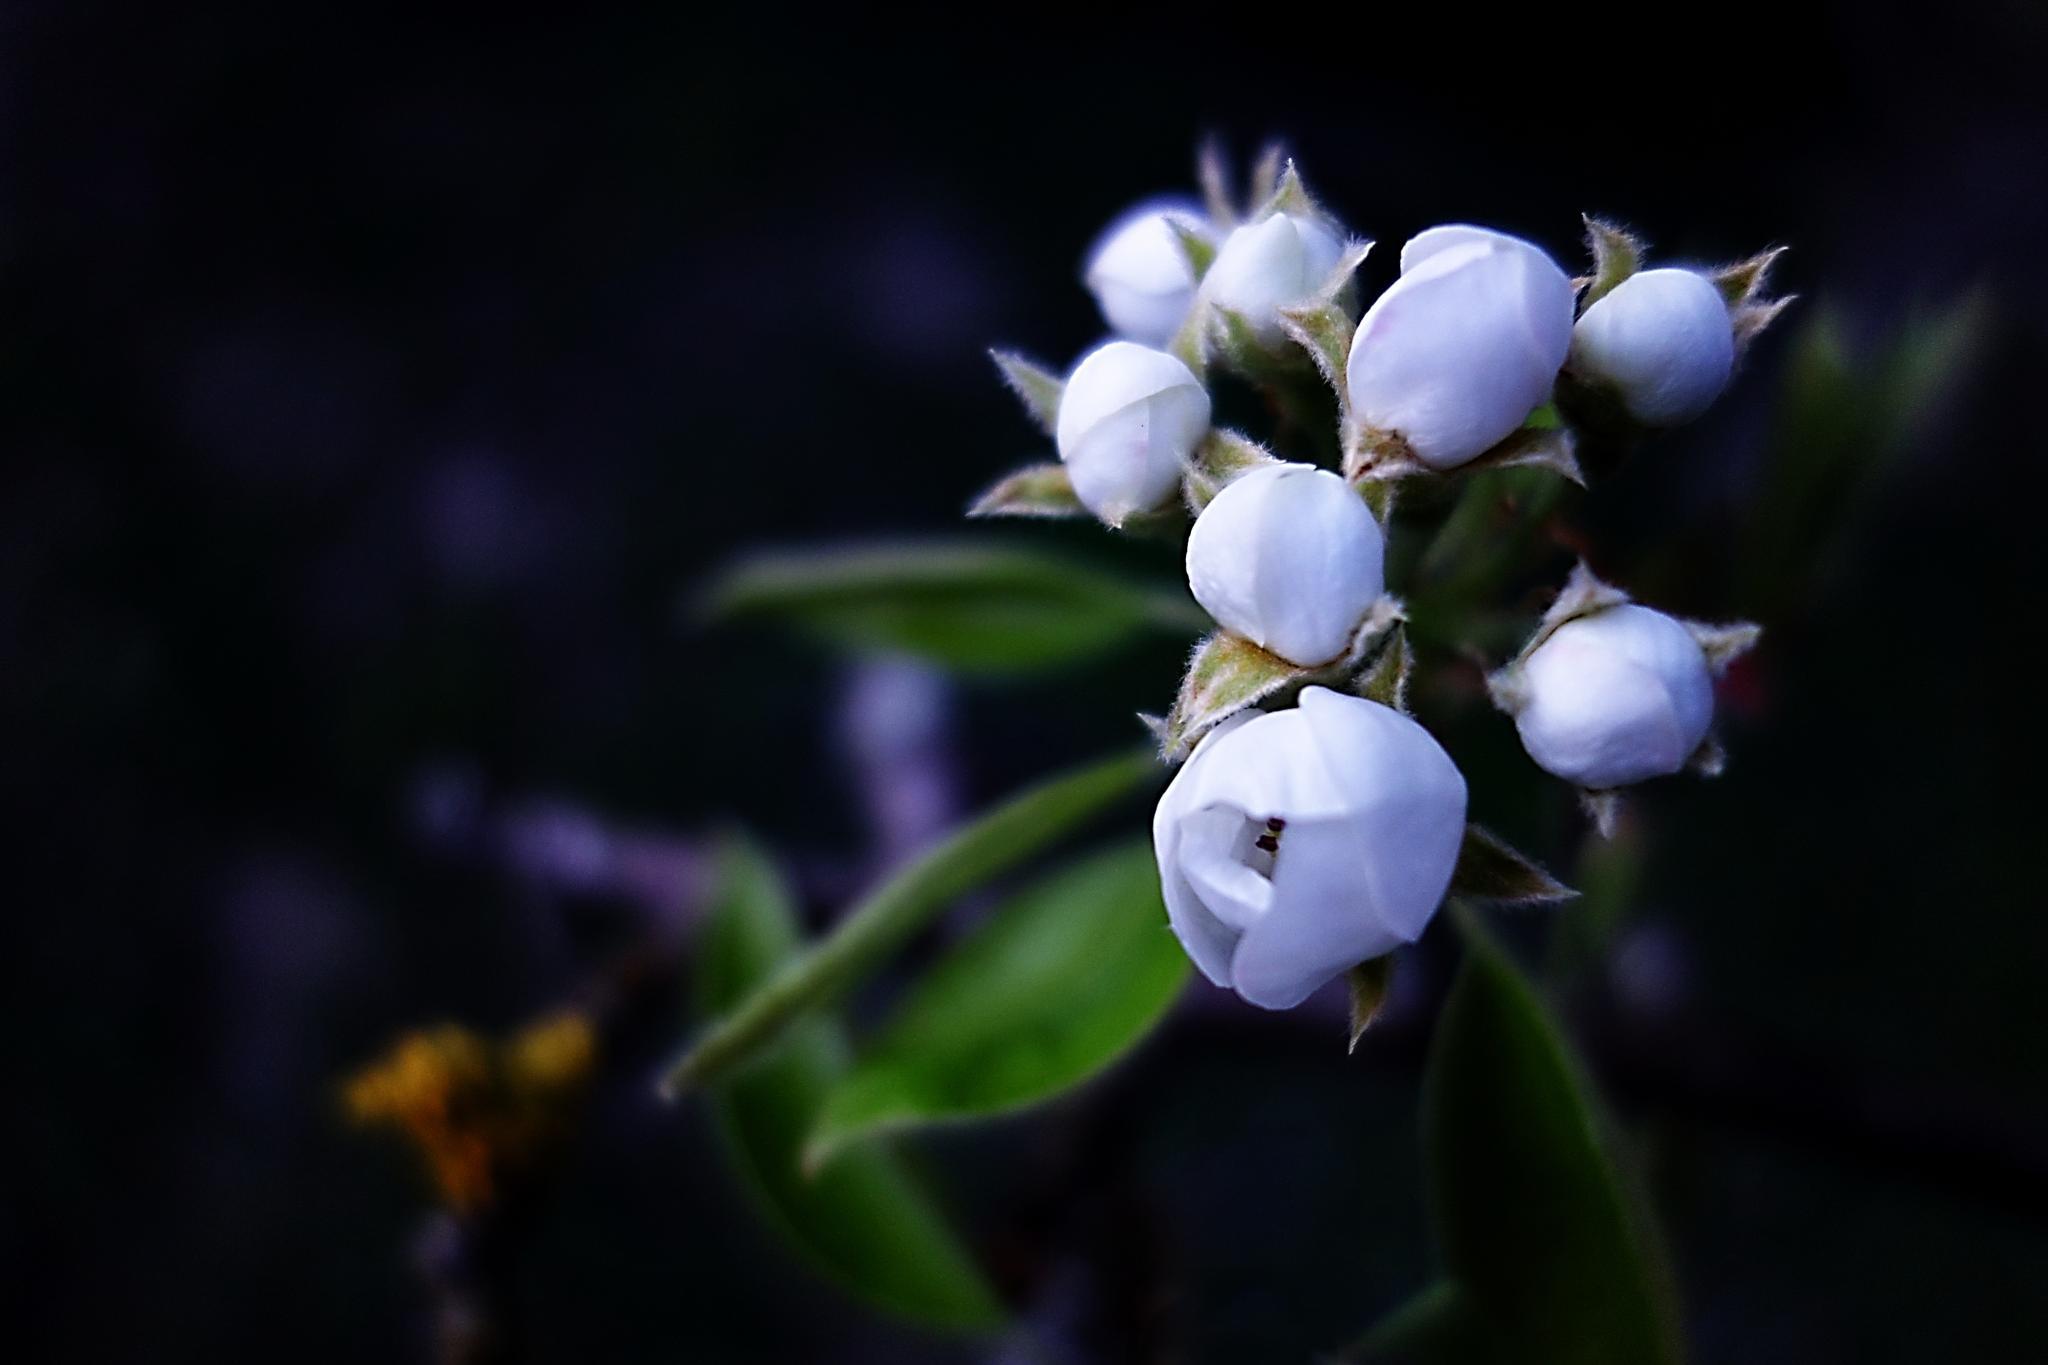 awakening - tree blossom by BernardaBizjak